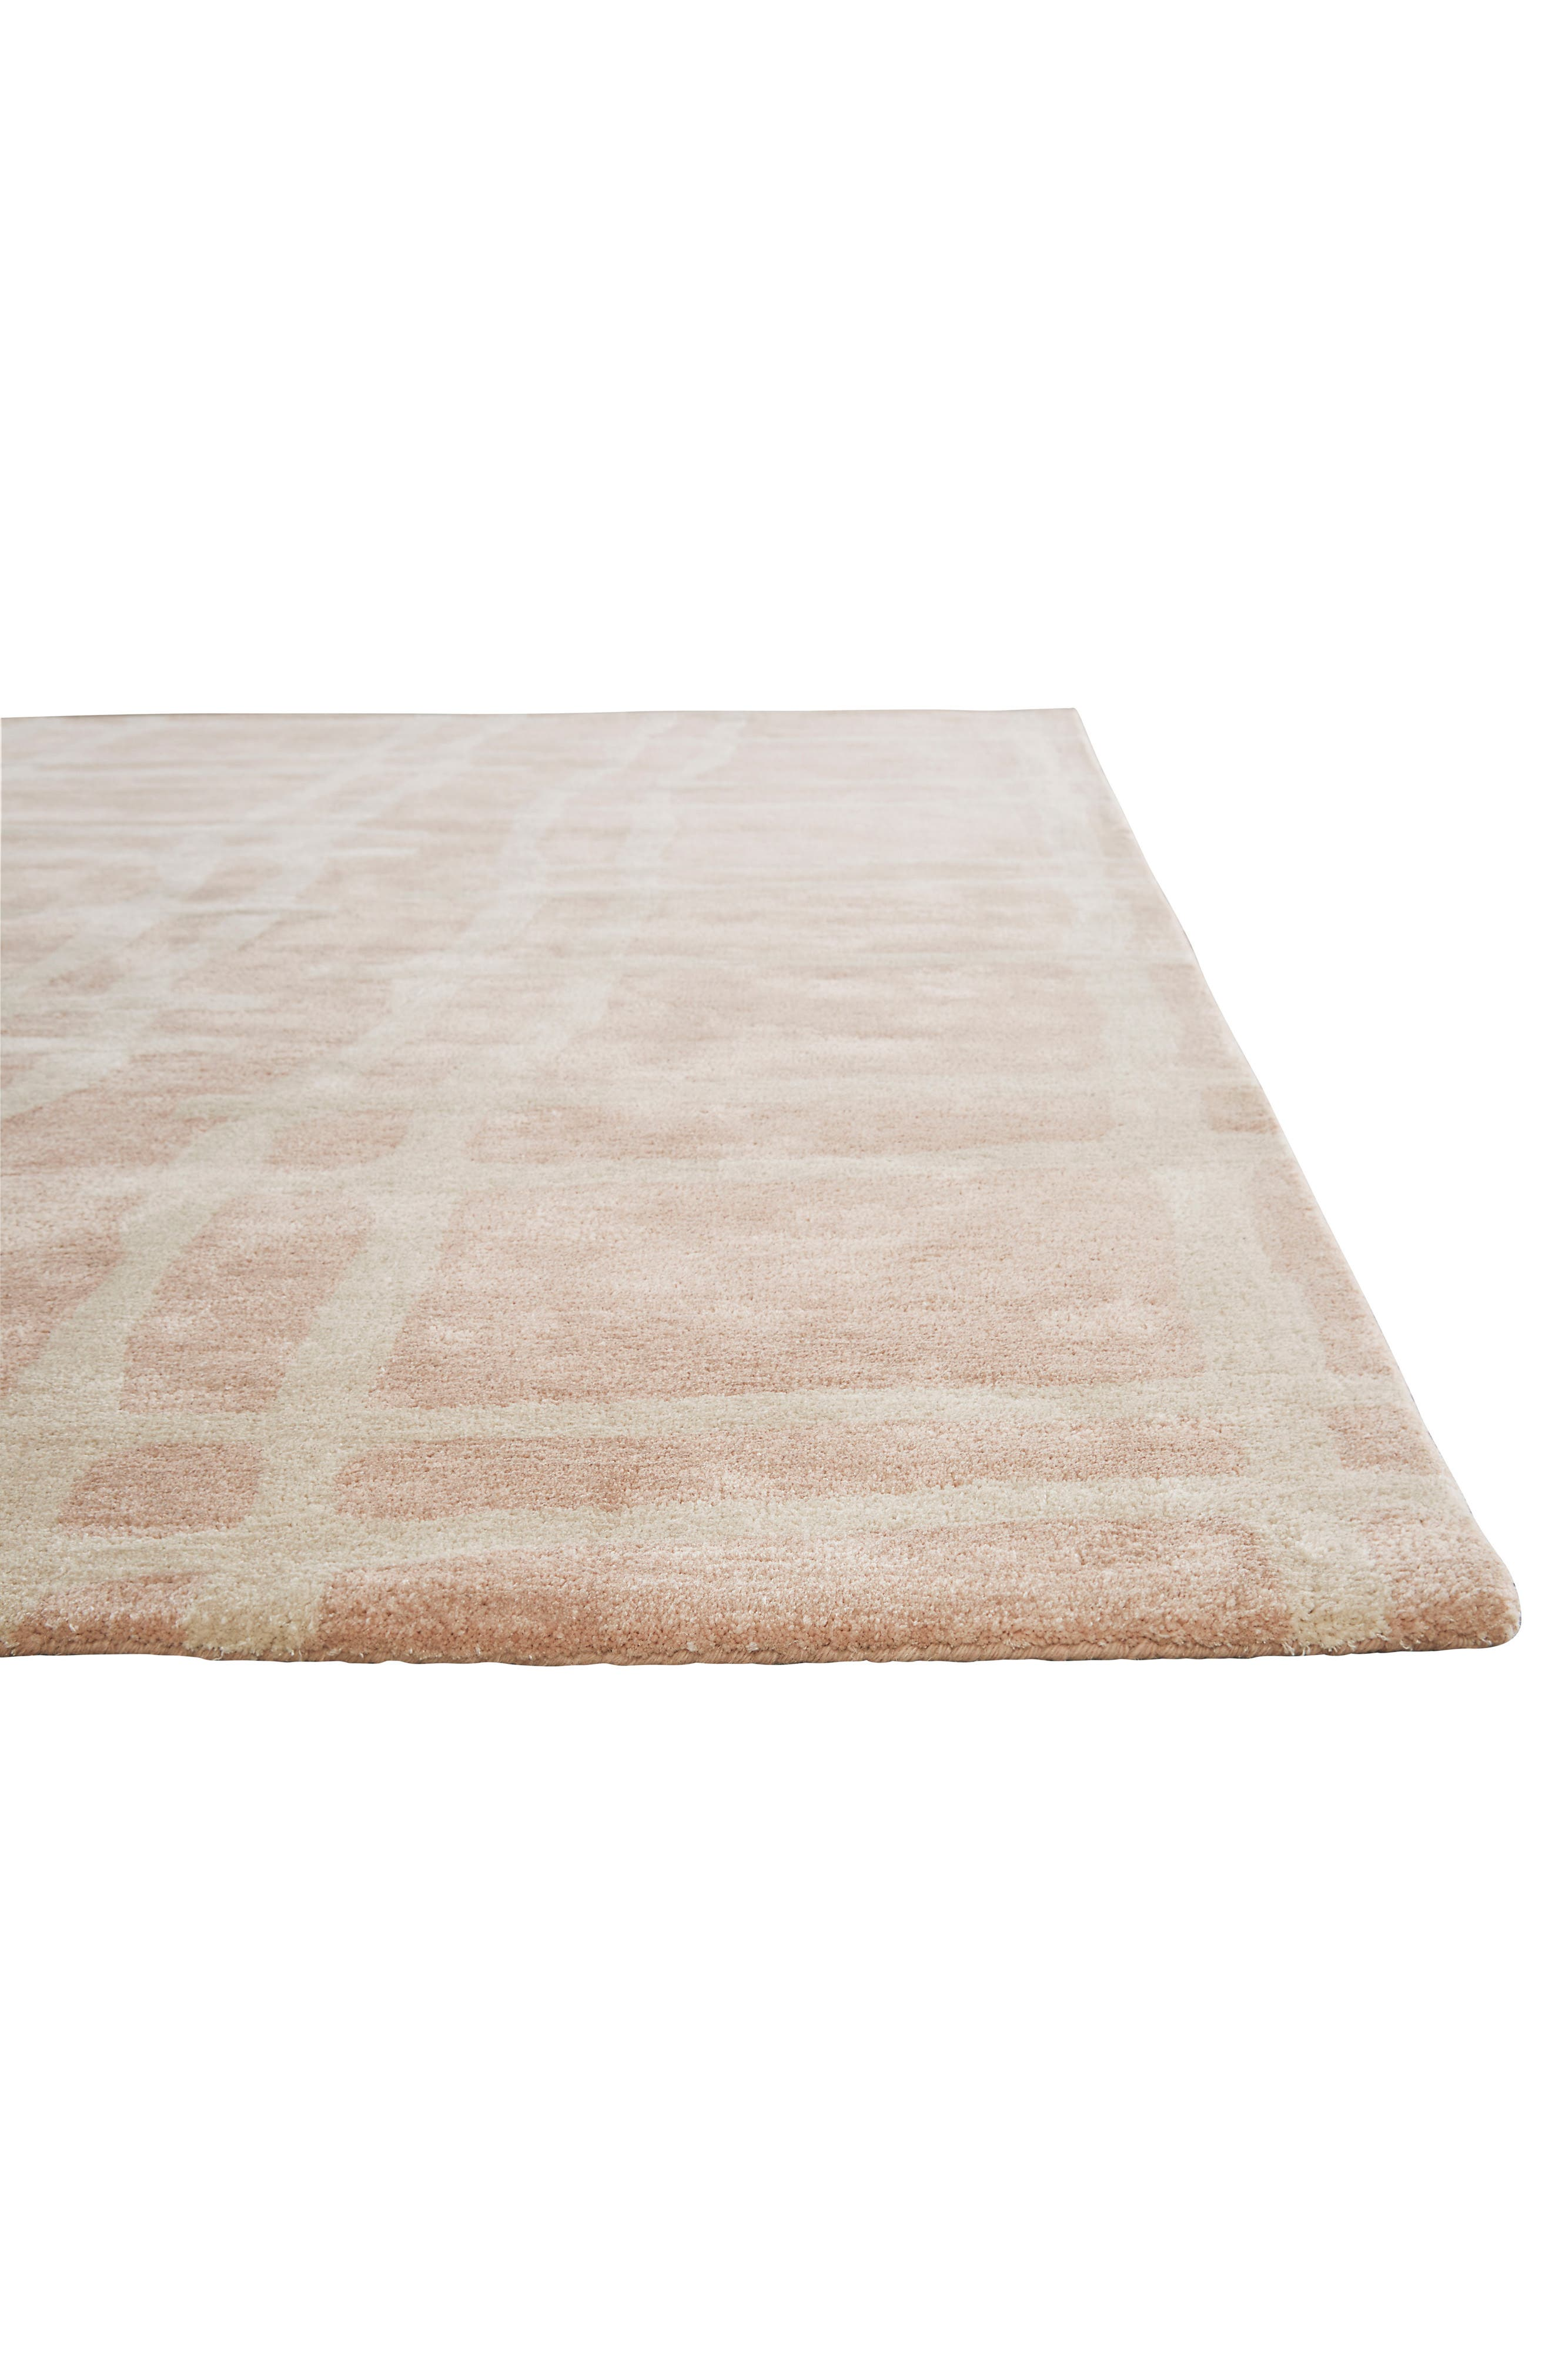 broken plaid rug,                             Alternate thumbnail 3, color,                             650